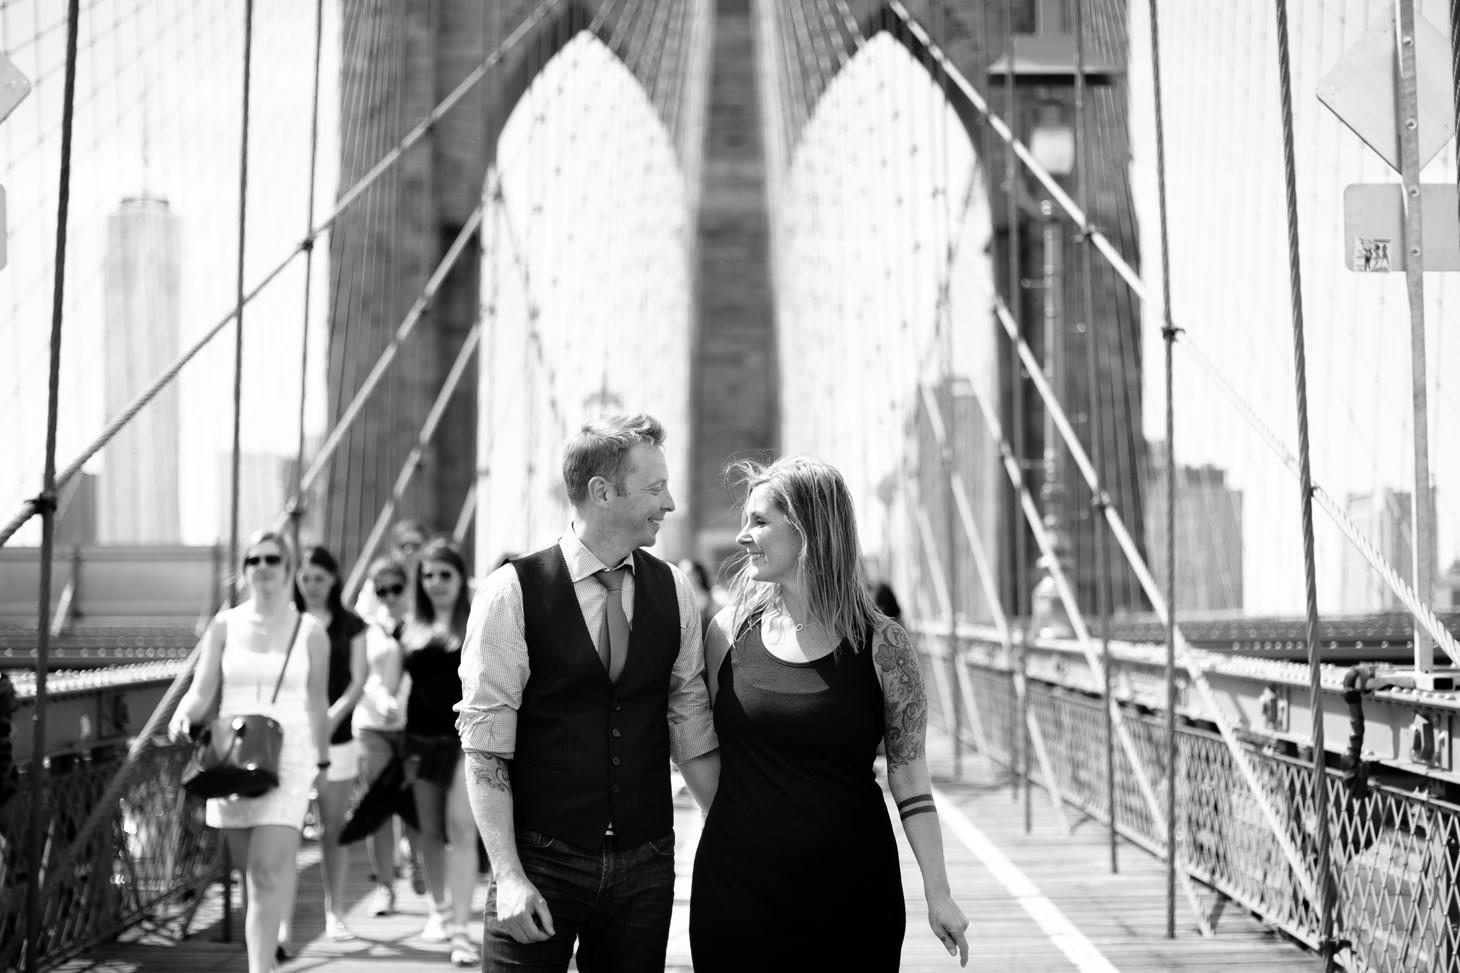 nyc-wedding-photographer-brooklyn-bridge-smitten-chickens-engagement-brooklyn-bridge-001.jpg